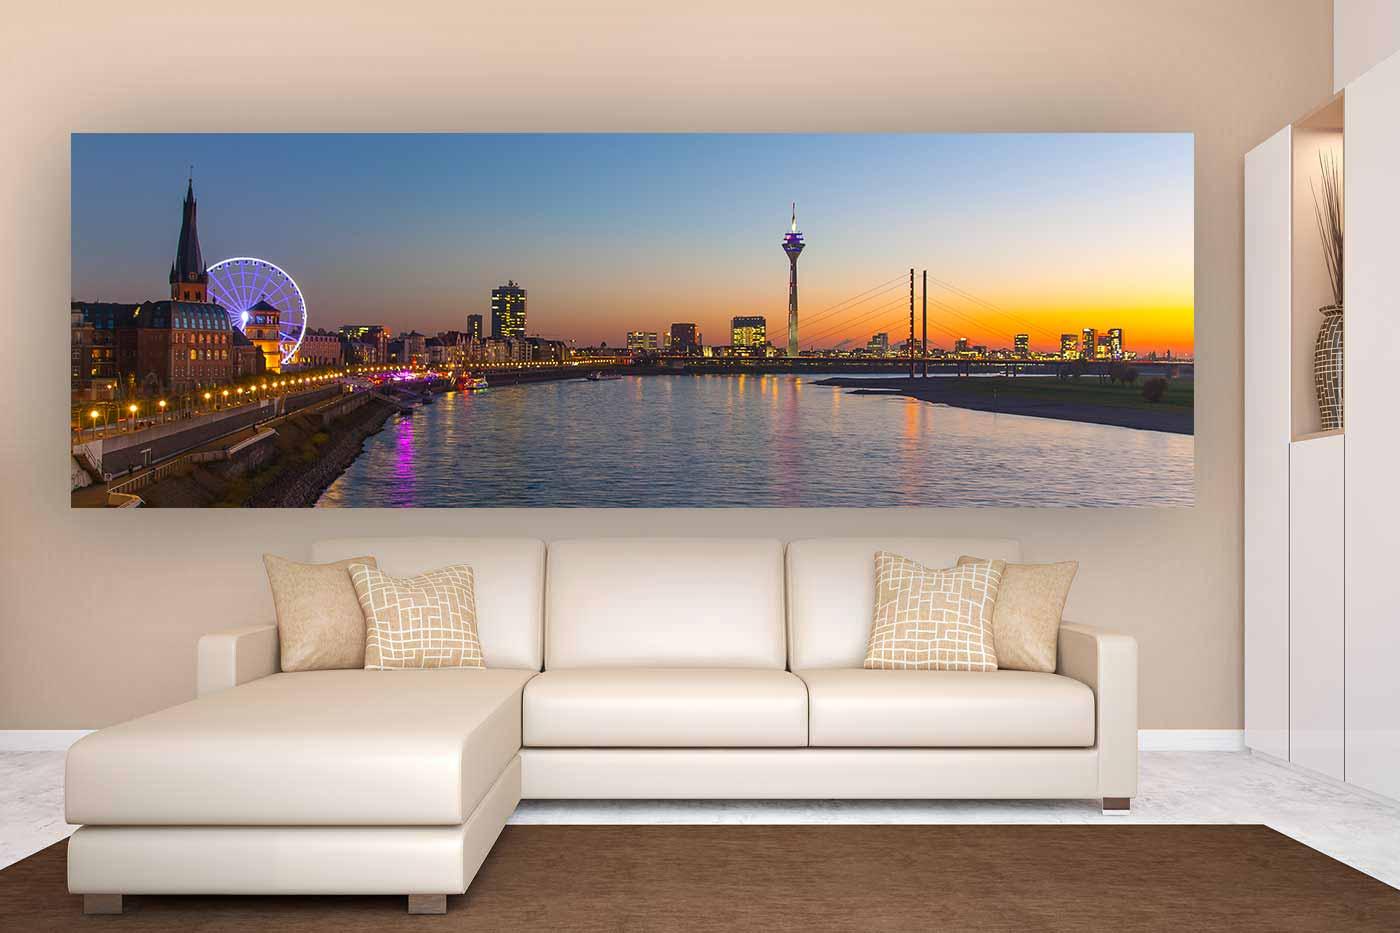 A Skyline Panorama Art Picture| Riesenrad Düsseldorf an der Rheinpromenade